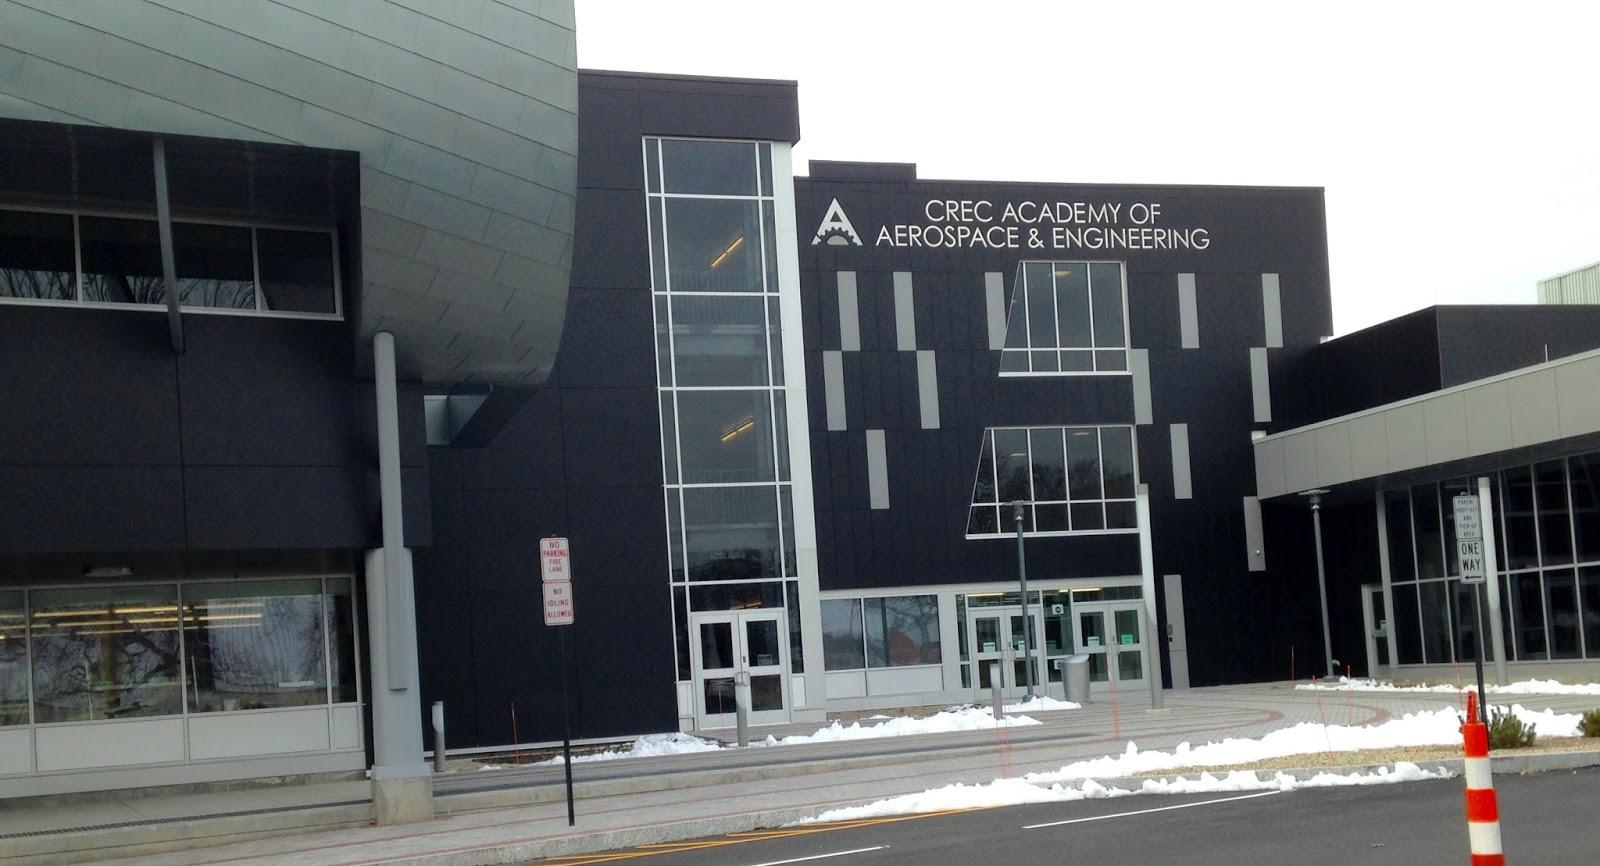 Best Aerospace Engineering Schools >> travels: CREC Academy of Aerospace & Engineering, Windsor,Connecticut